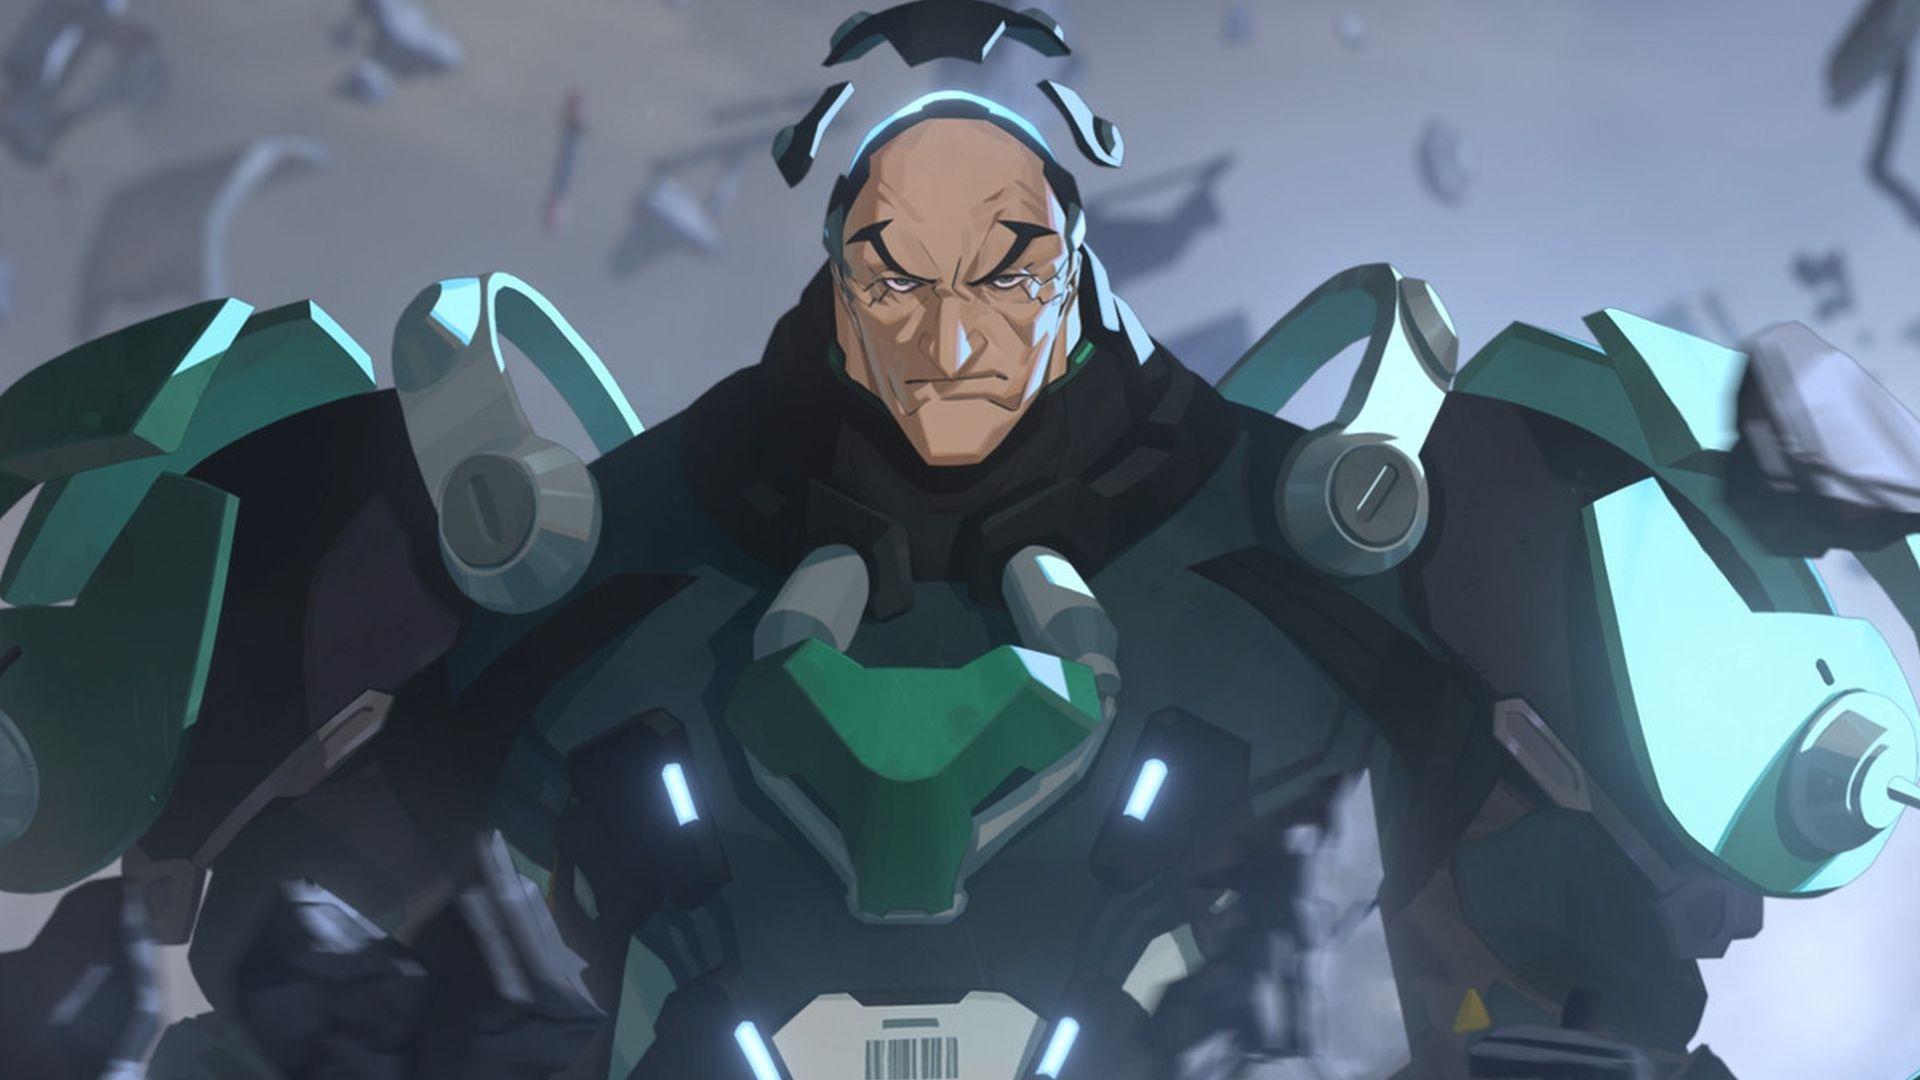 Sigma، جدیدترین قهرمان Overwatch دردسترس بازیبازها قرار گرفت